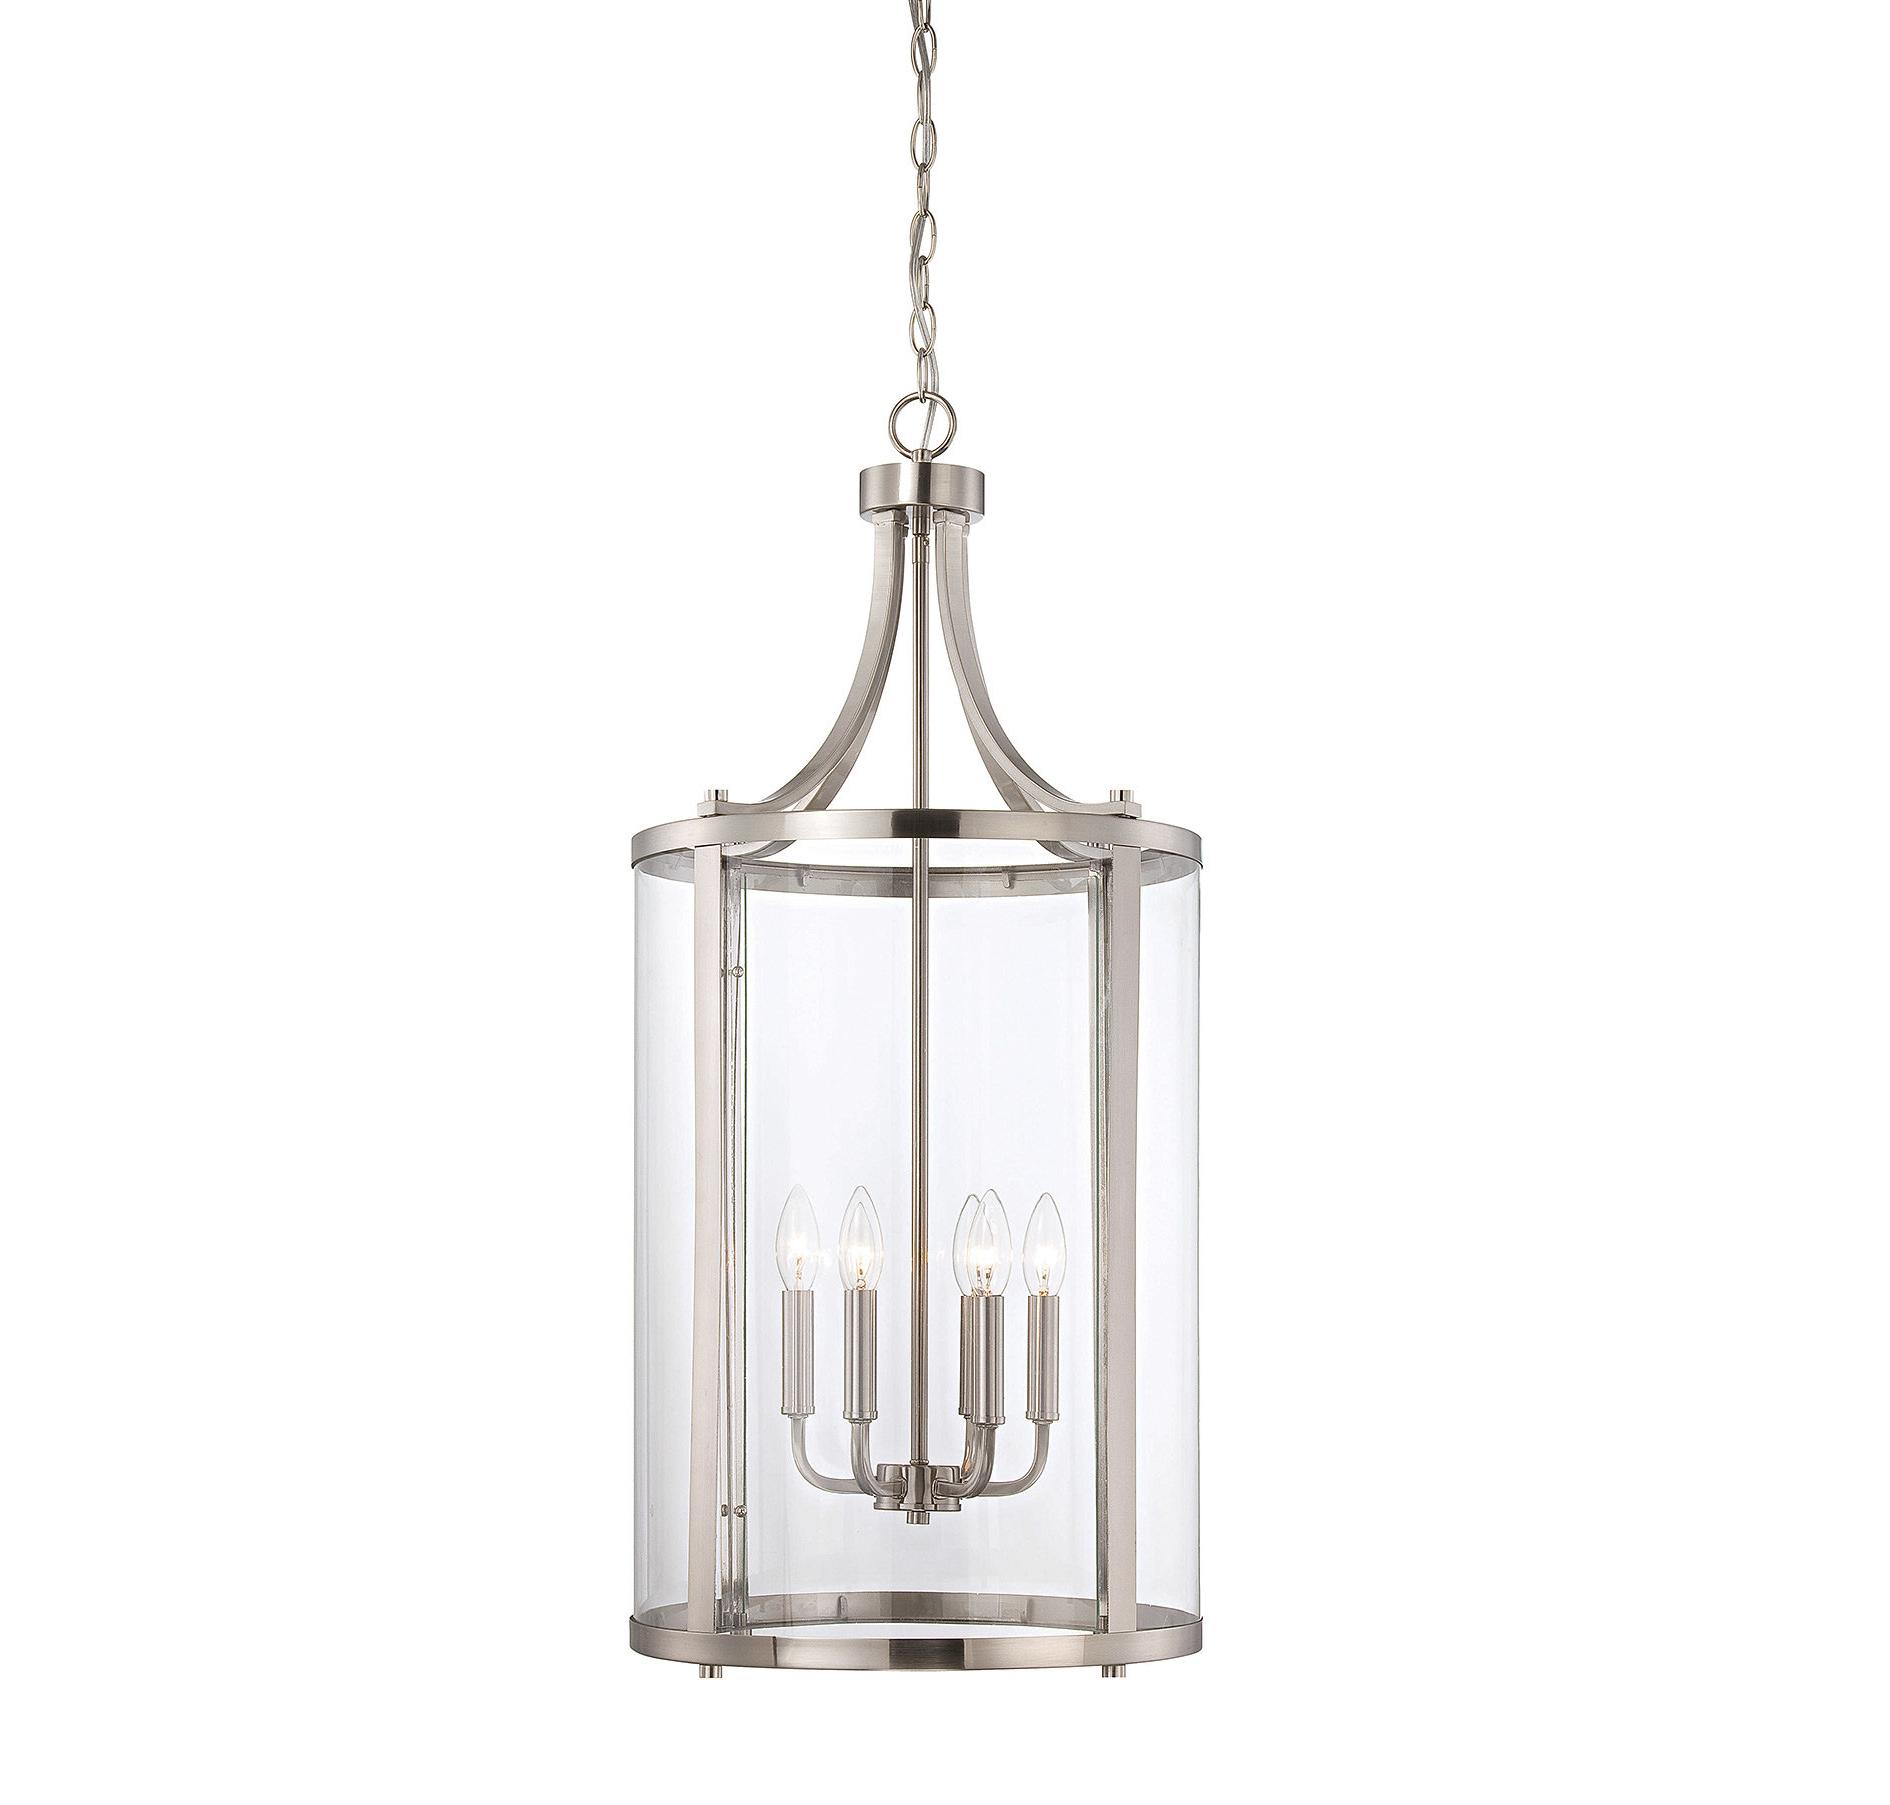 Brookville 6 Light Lantern Cylinder Pendant For Most Popular Armande 3 Light Lantern Geometric Pendants (View 13 of 25)